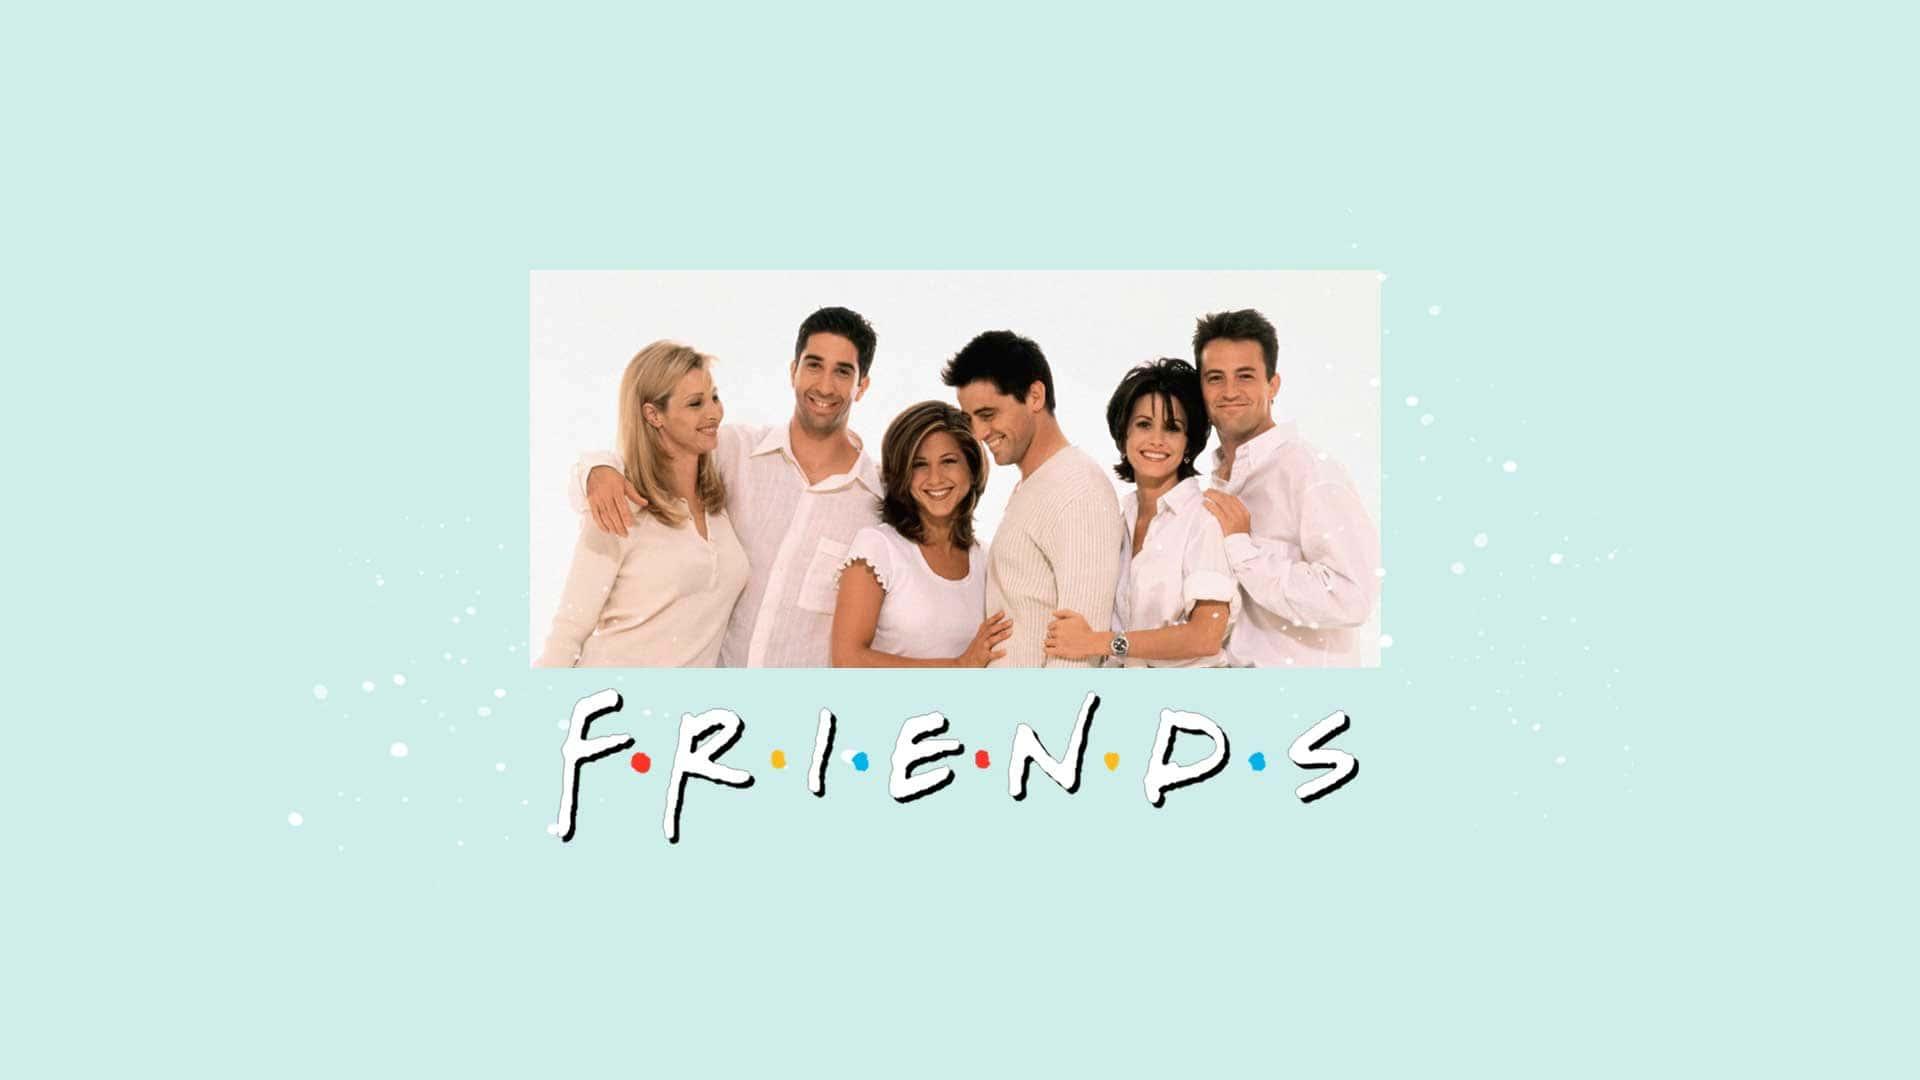 ¿Qué opositor de Friends eres?